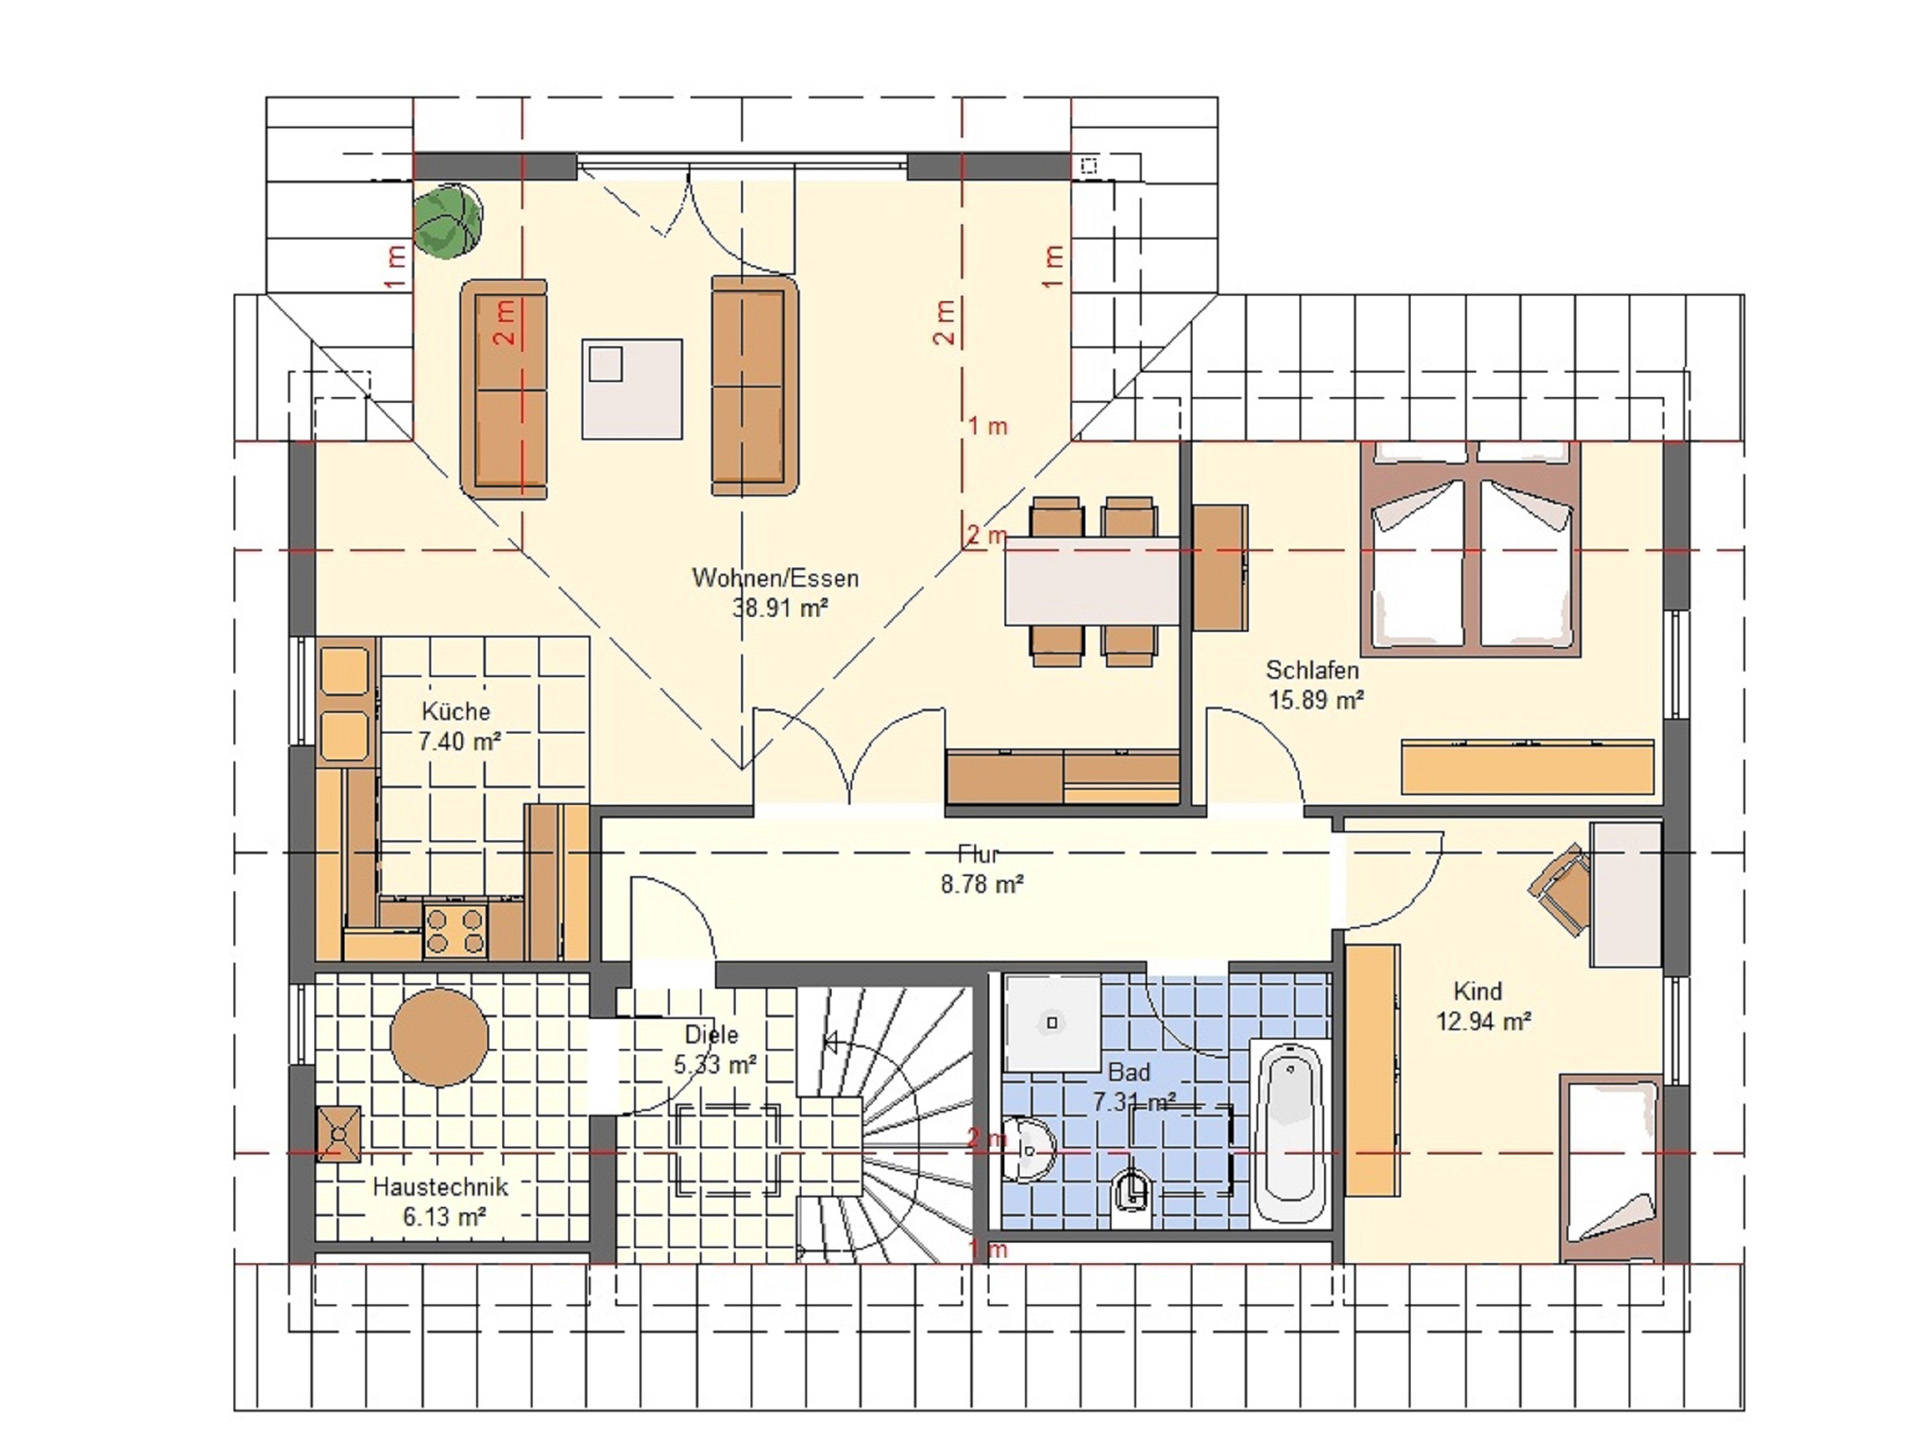 Haus Emilia von W. Leberer Massivbau Grundriss DG 1